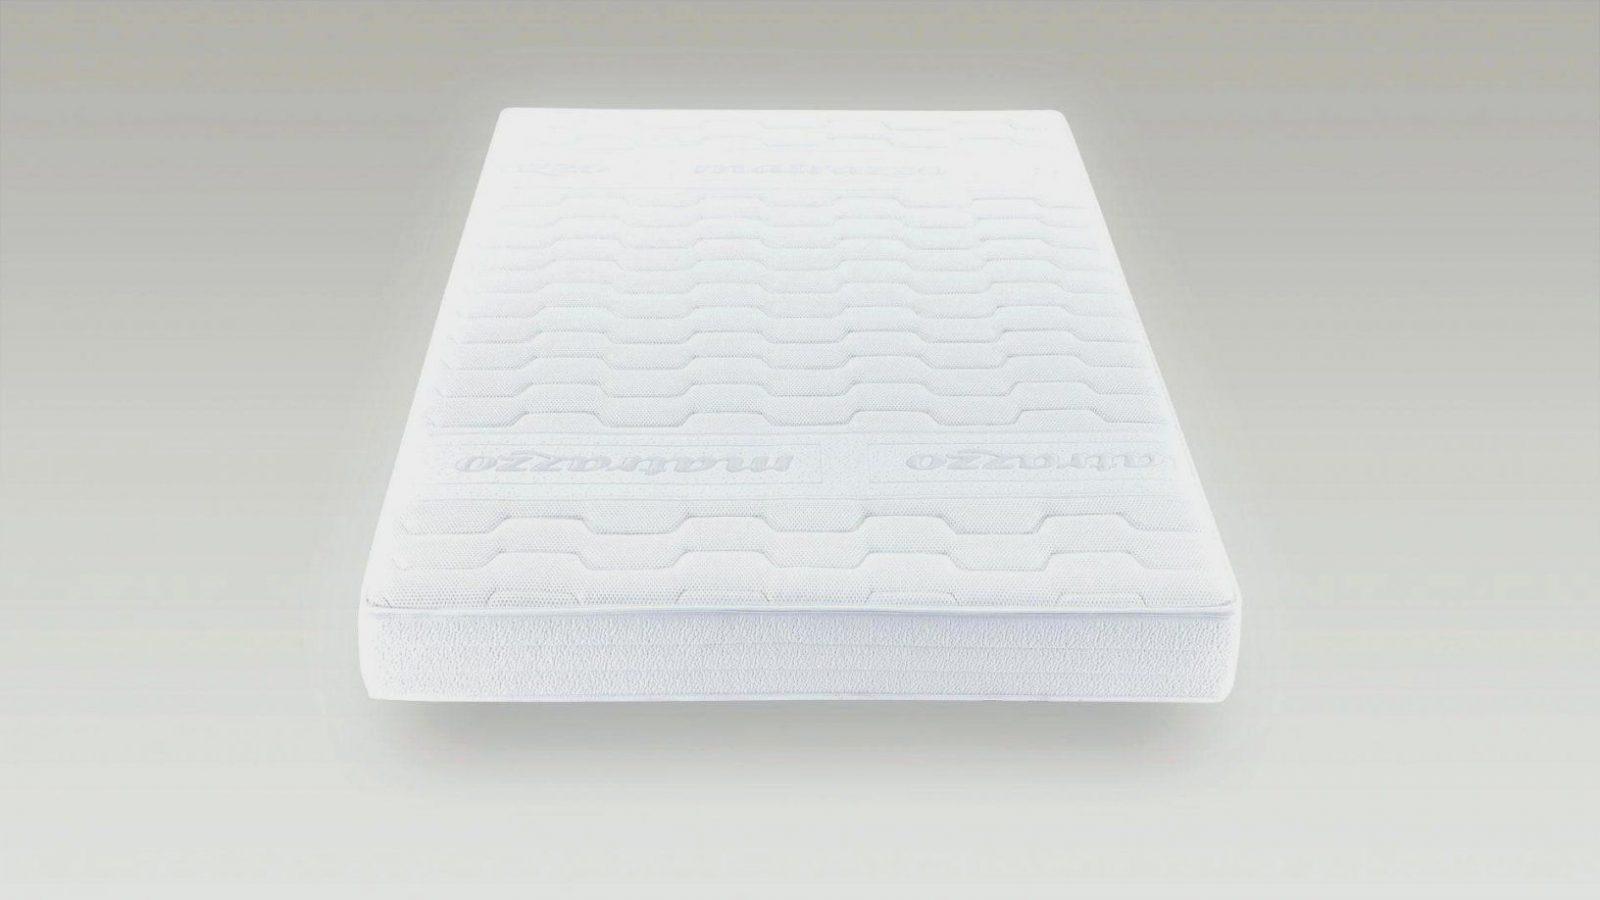 Stilvolle Welcher Topper Bei Rückenschmerzen Matratzen Bei Rã von Welcher Topper Bei Rückenschmerzen Bild